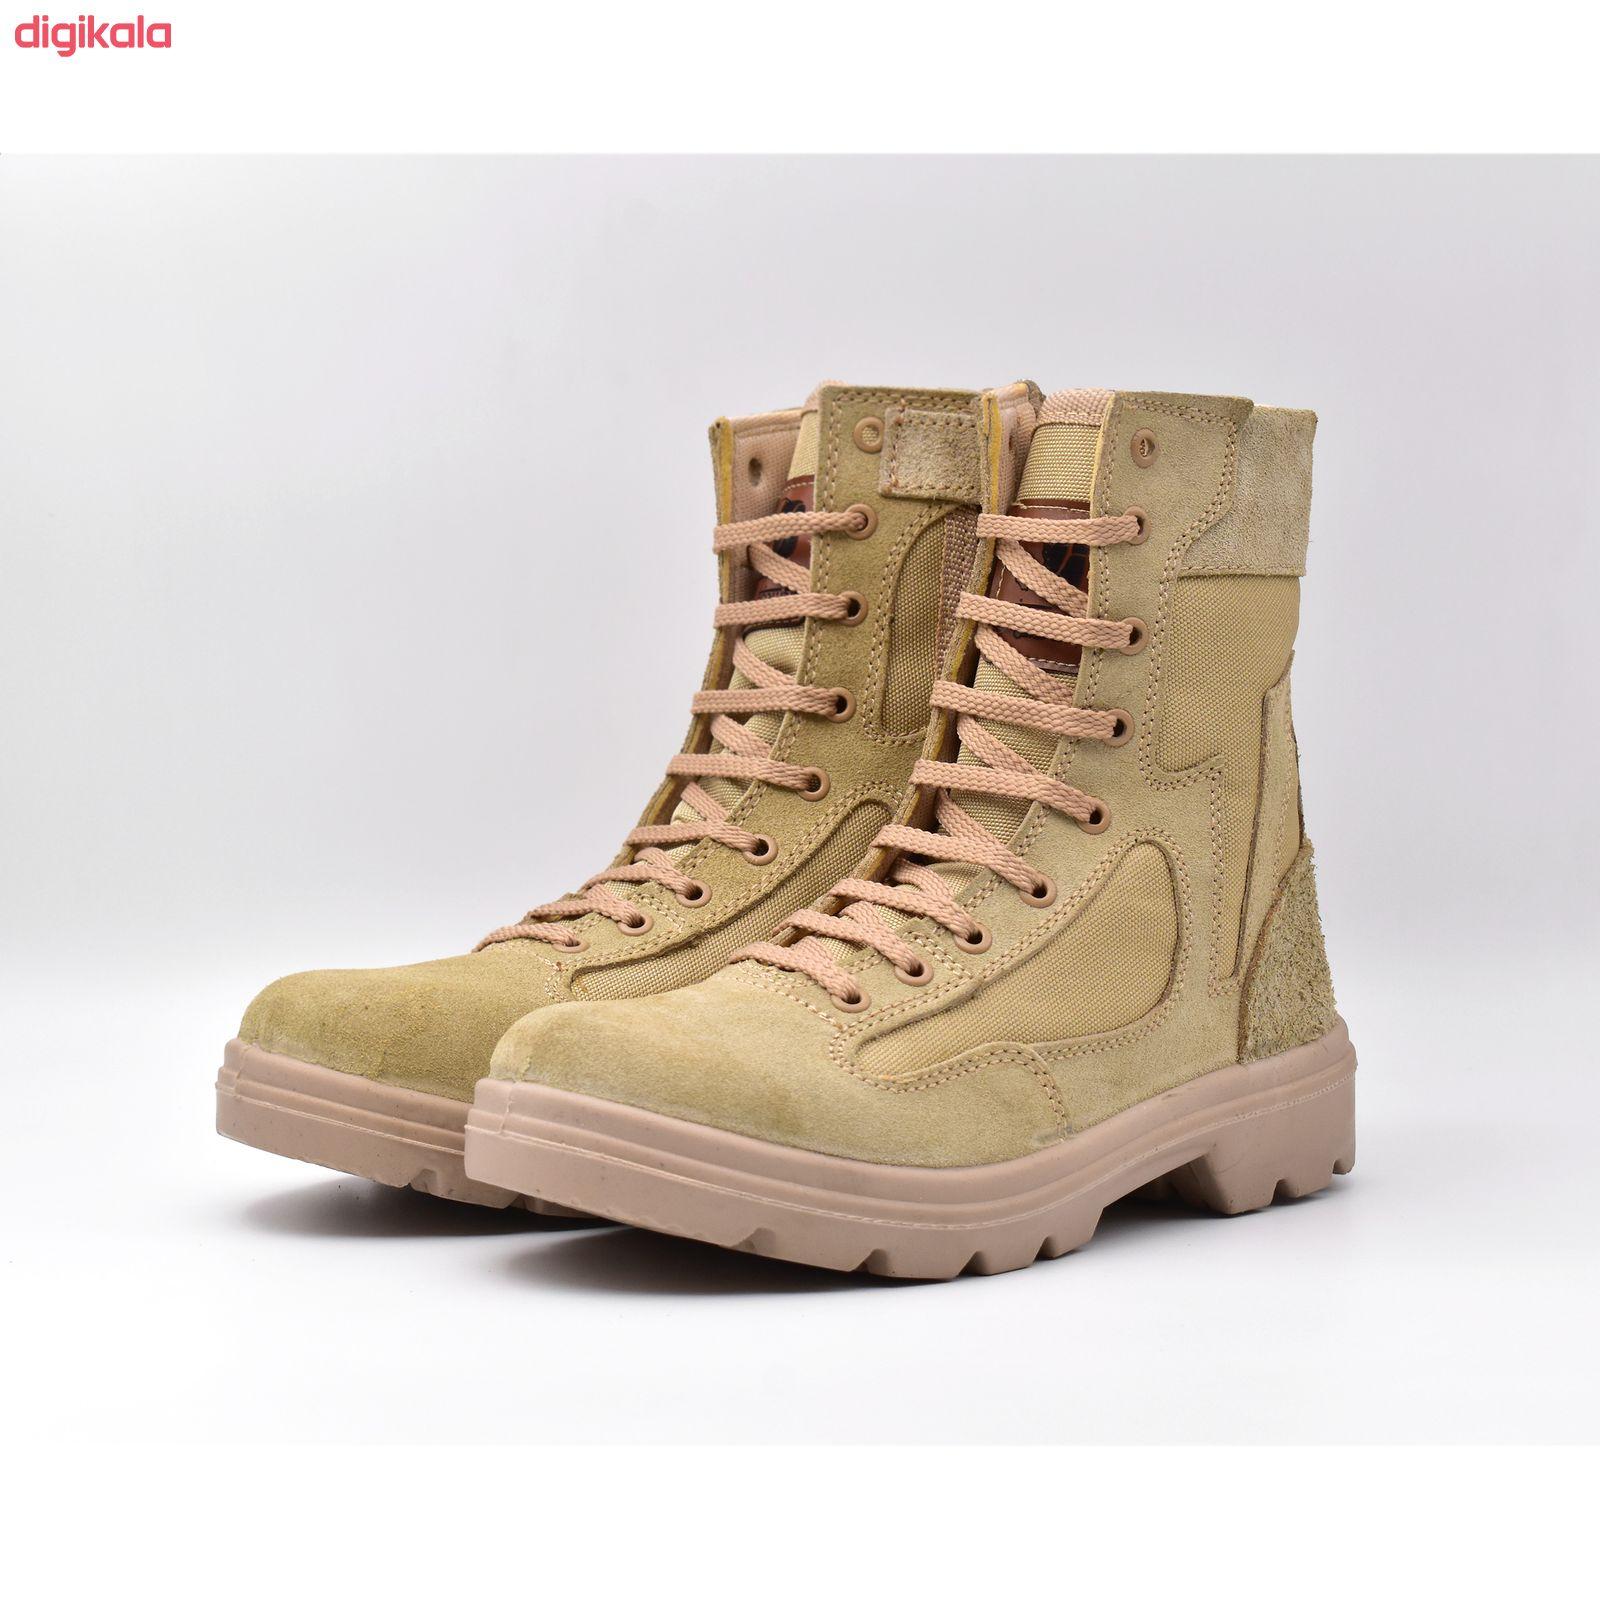 کفش کوهنوردی مردانه مدل Razm کد 8485 main 1 5